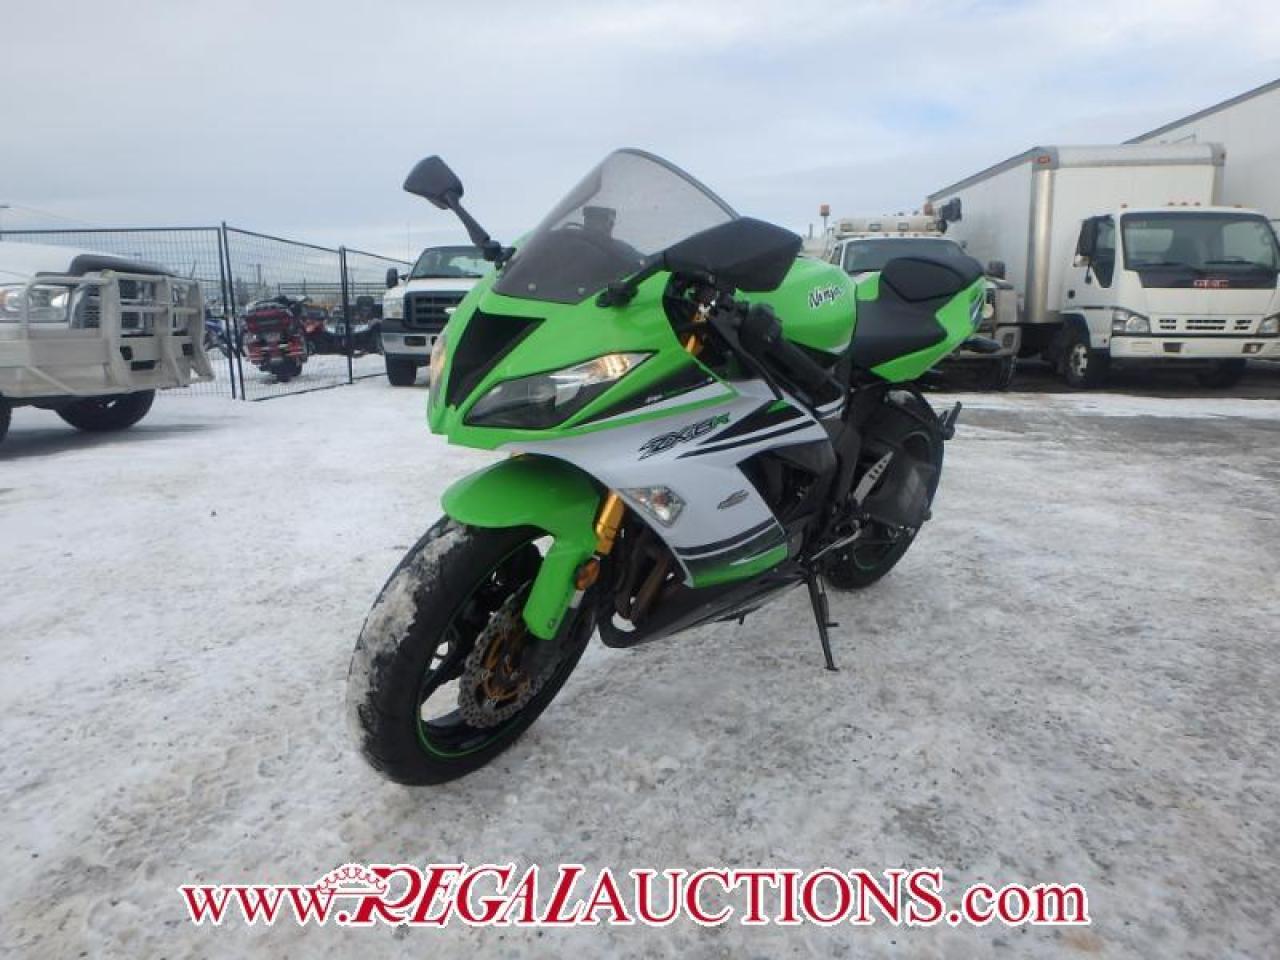 Photo of Green 2015 Kawasaki NINJA 636 ZX6R ABS  SPORTS MOTORCYCLE